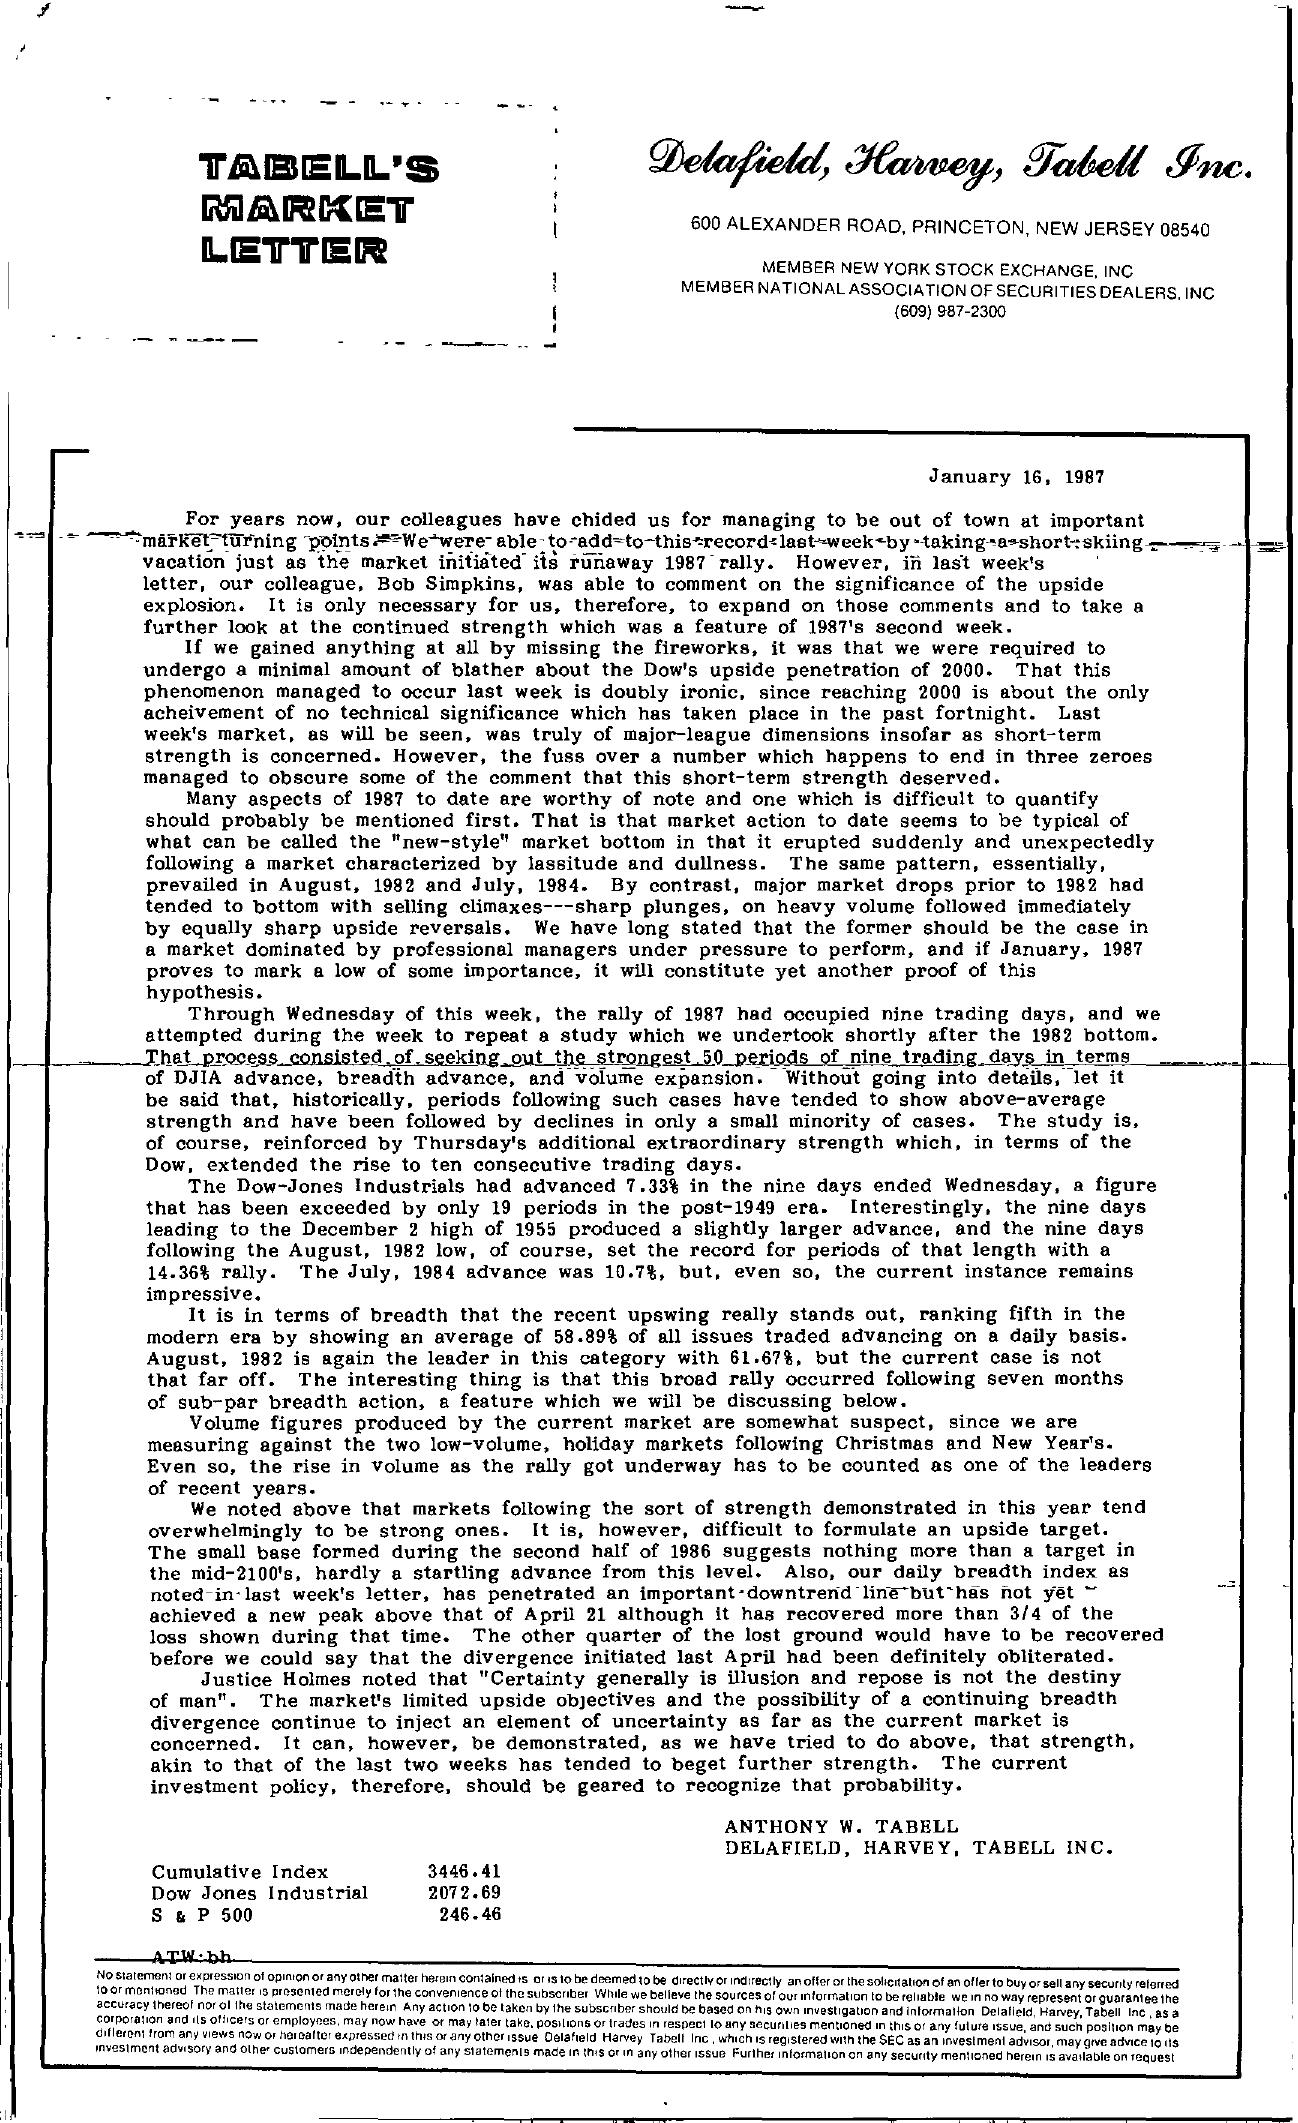 Tabell's Market Letter - January 16, 1987